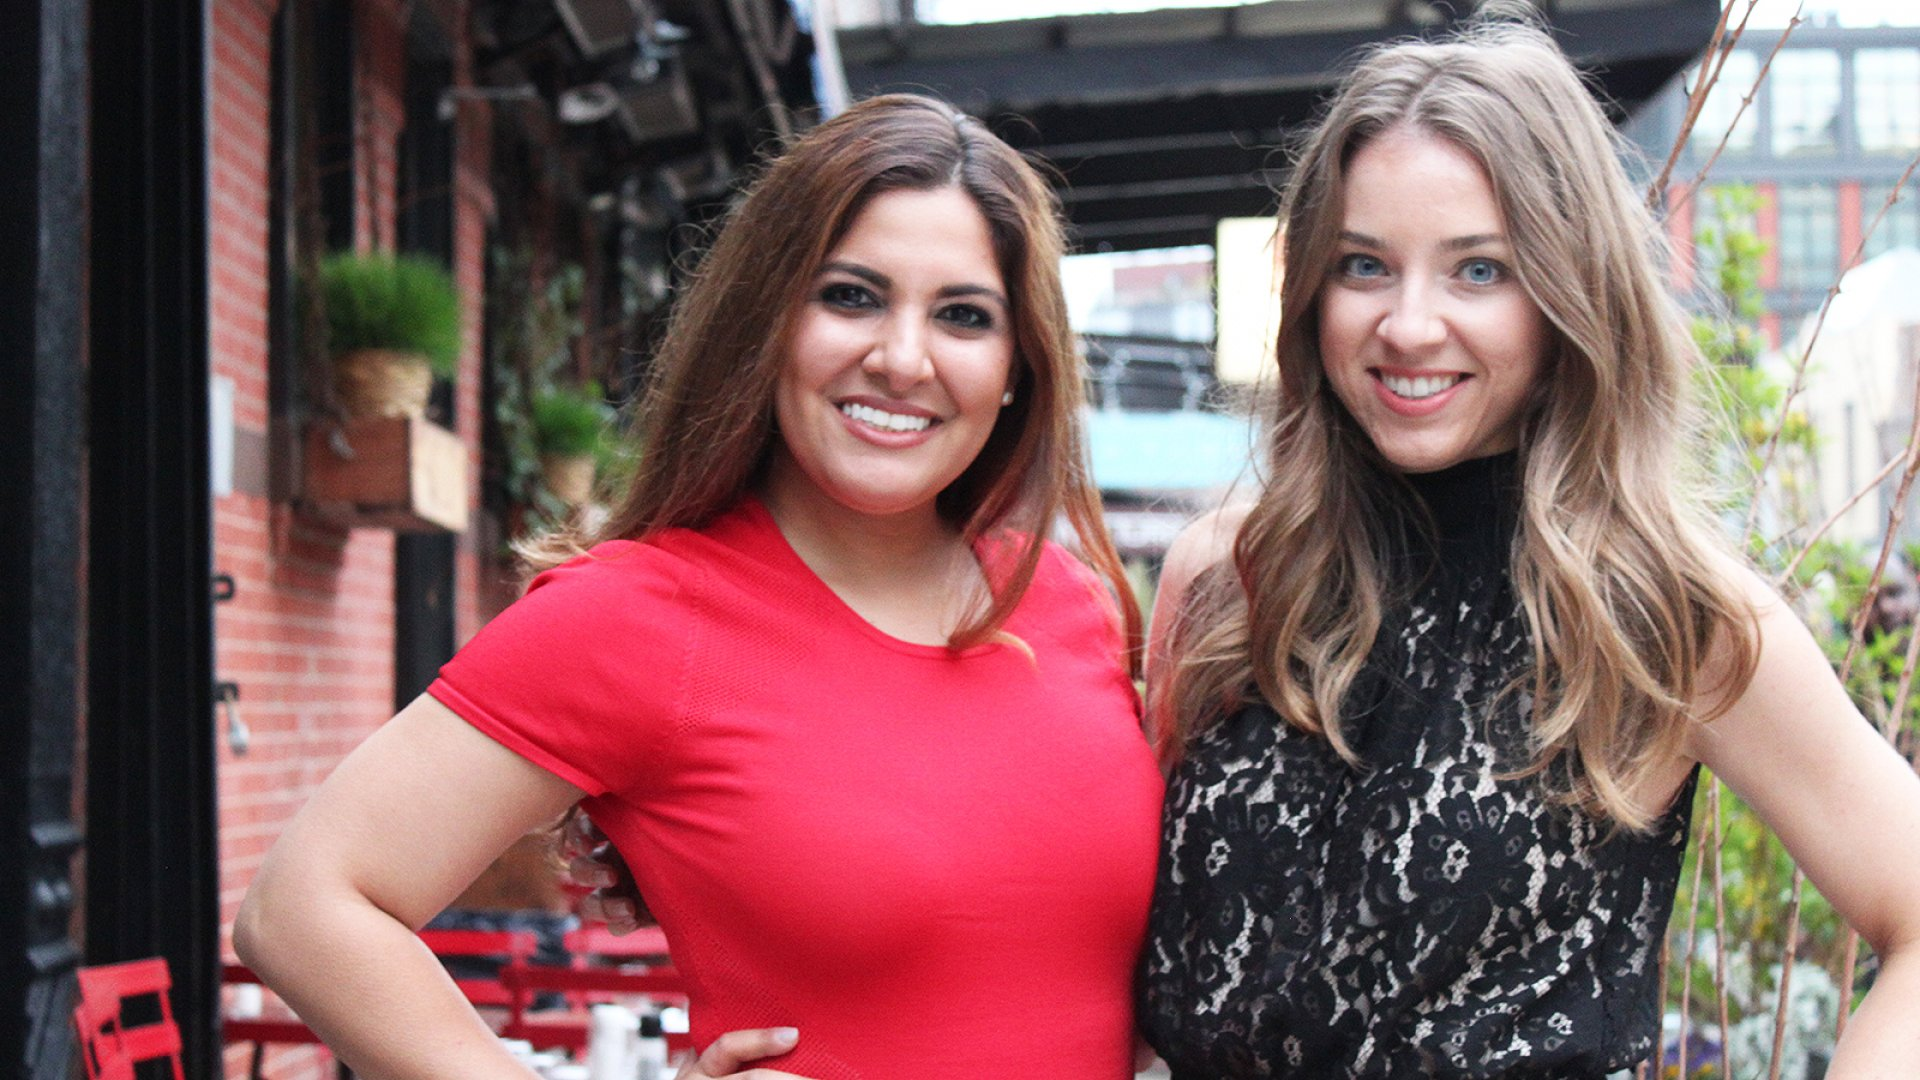 Invibed co-founded Dani Pascarella (left) and Korrie Martinez.